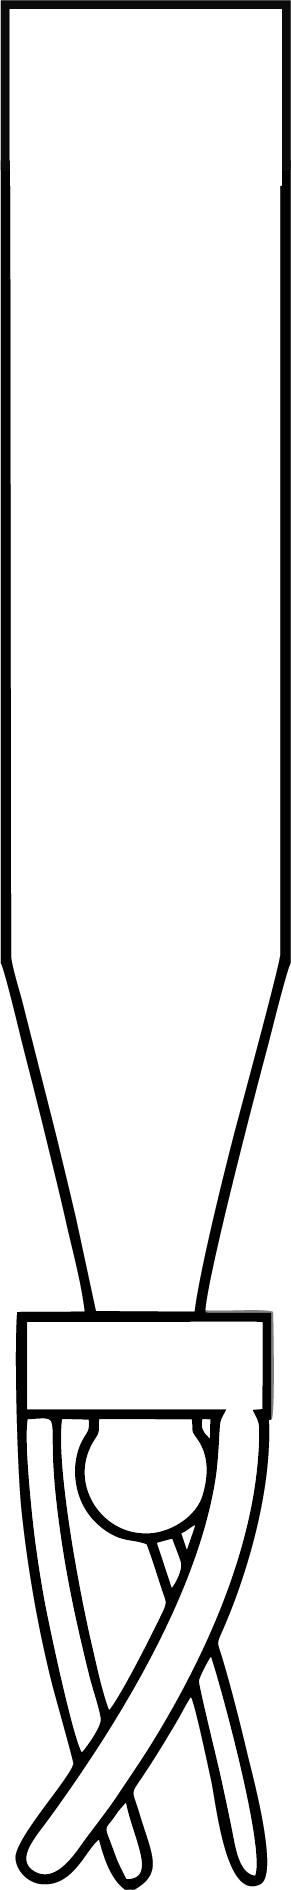 0,8ml Mikroeinsatz, 38x8 mm, Klarglas, mit Polymerfuß